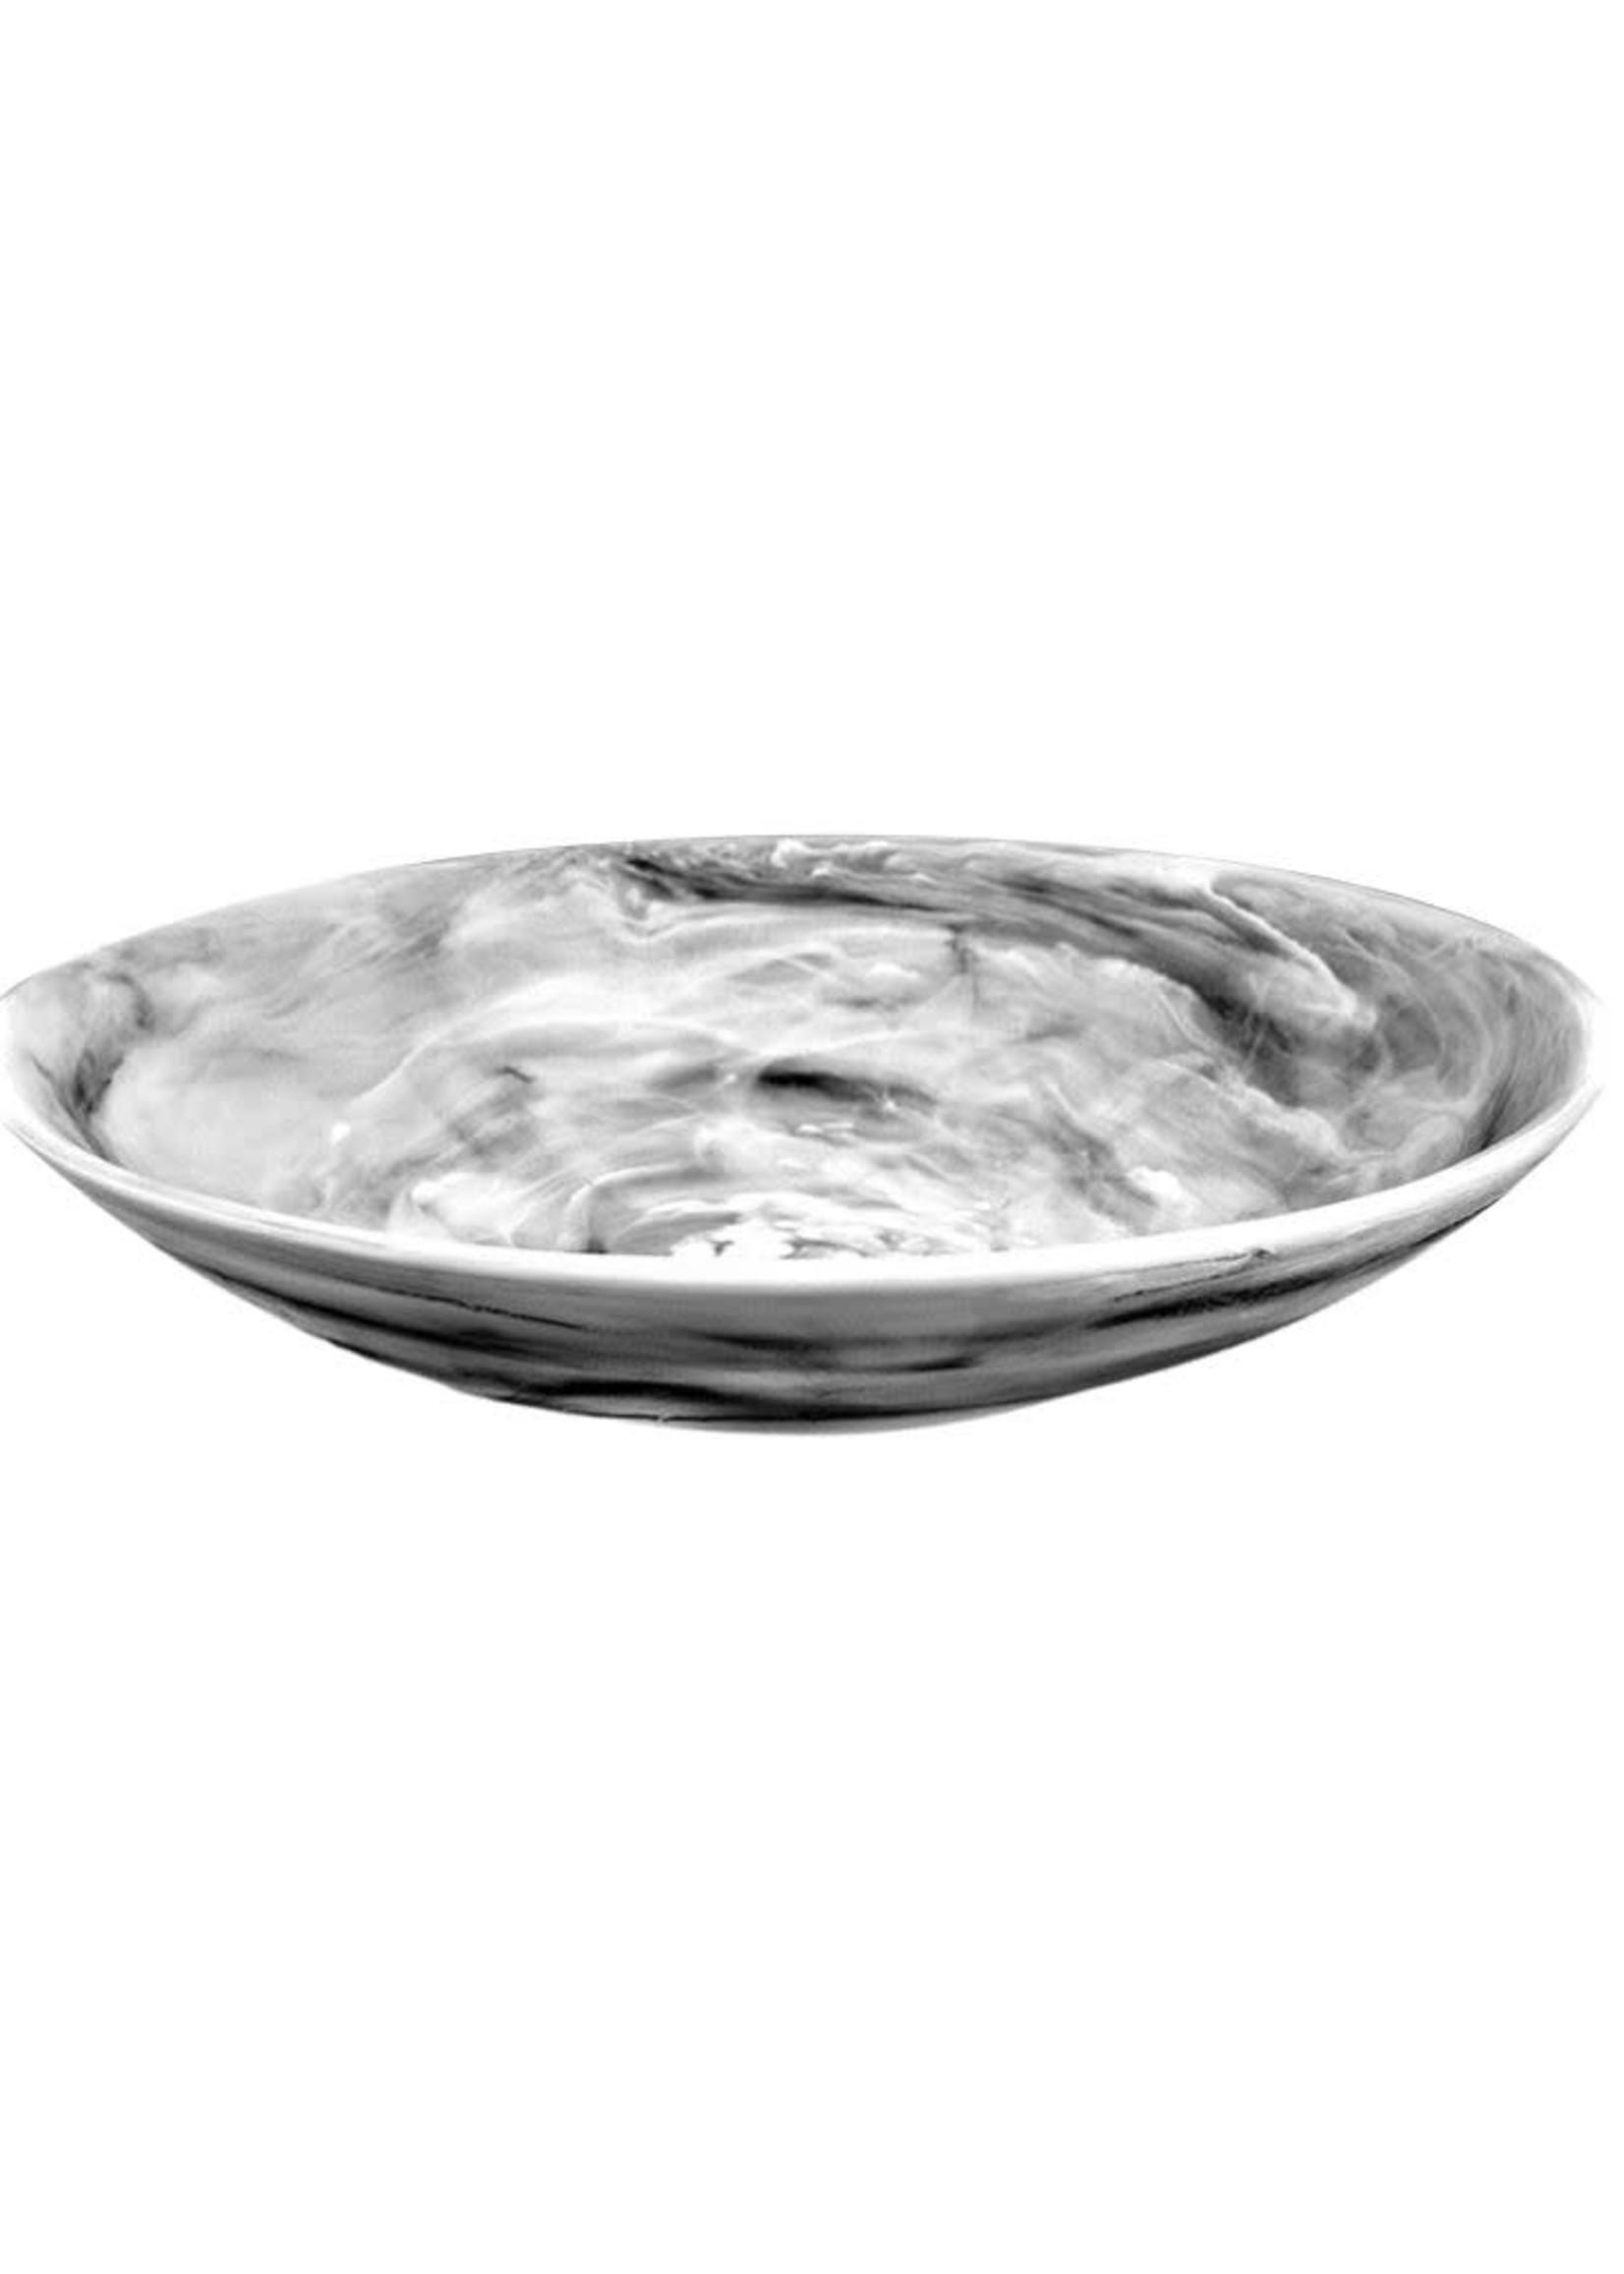 Everyday Medium Bowl w Salad Server Set 2pc - Black Swirl